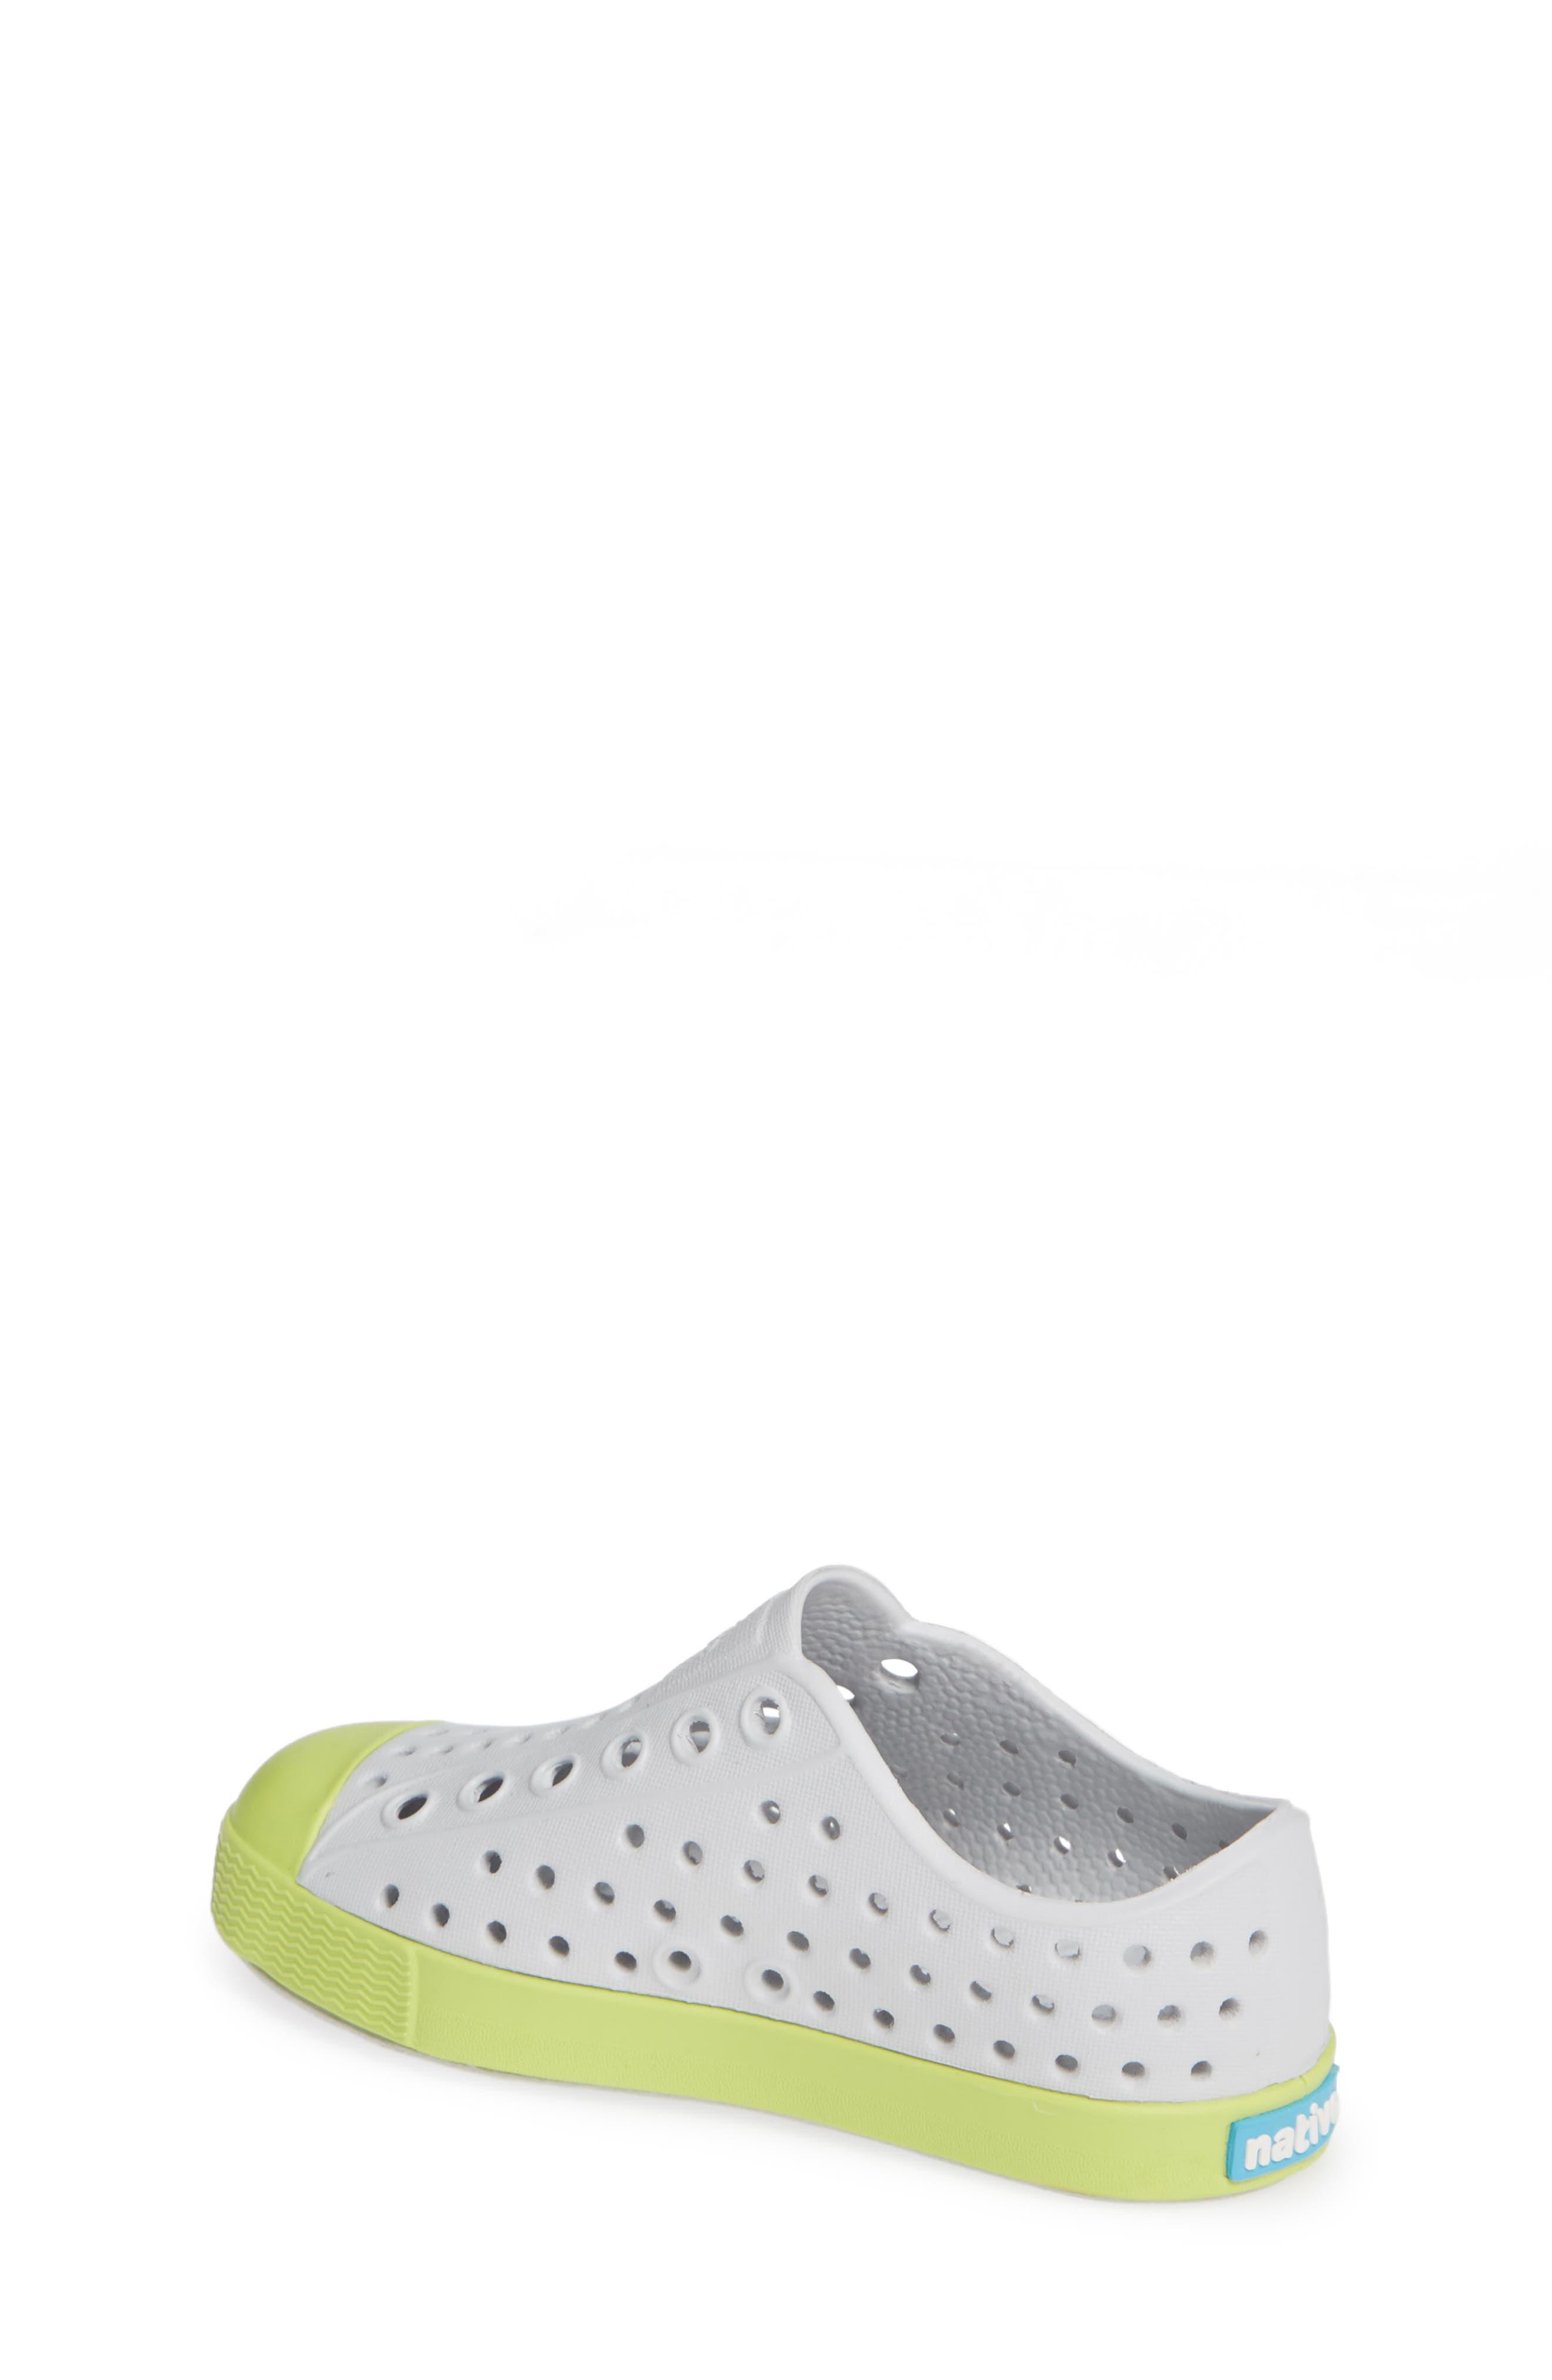 'Jefferson' Water Friendly Slip-On Sneaker,                             Alternate thumbnail 71, color,